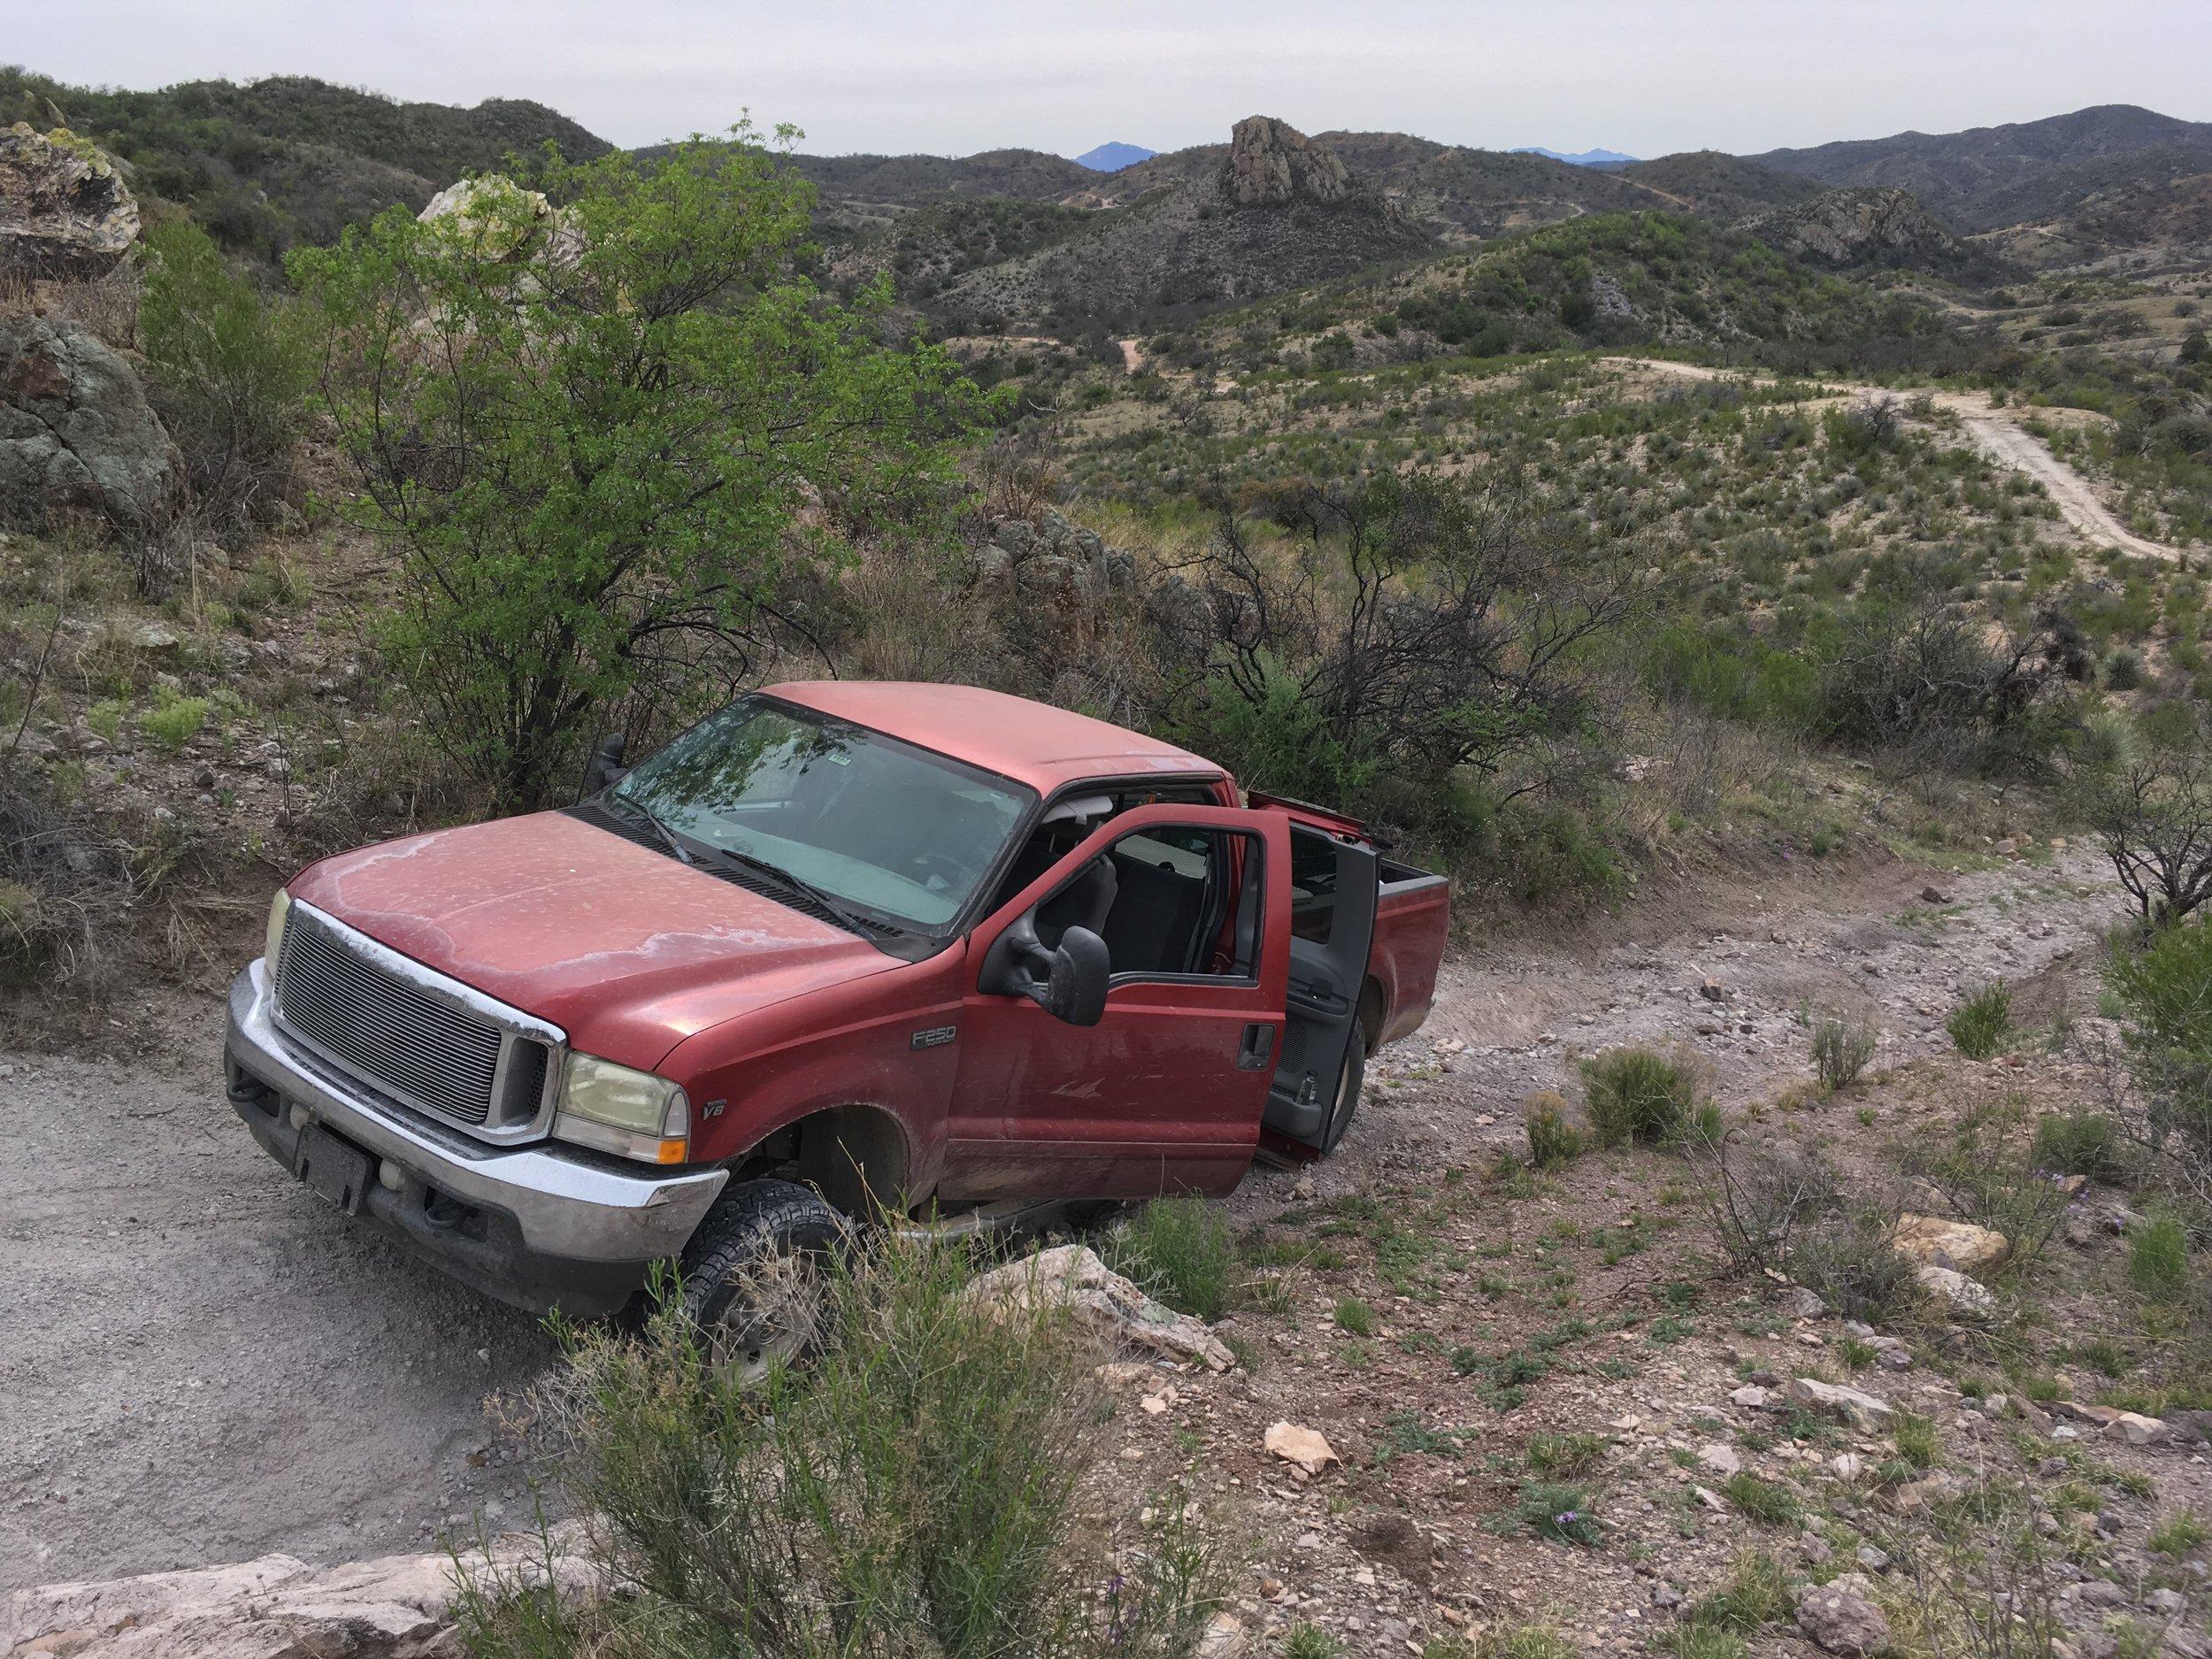 Braving rough remote roads